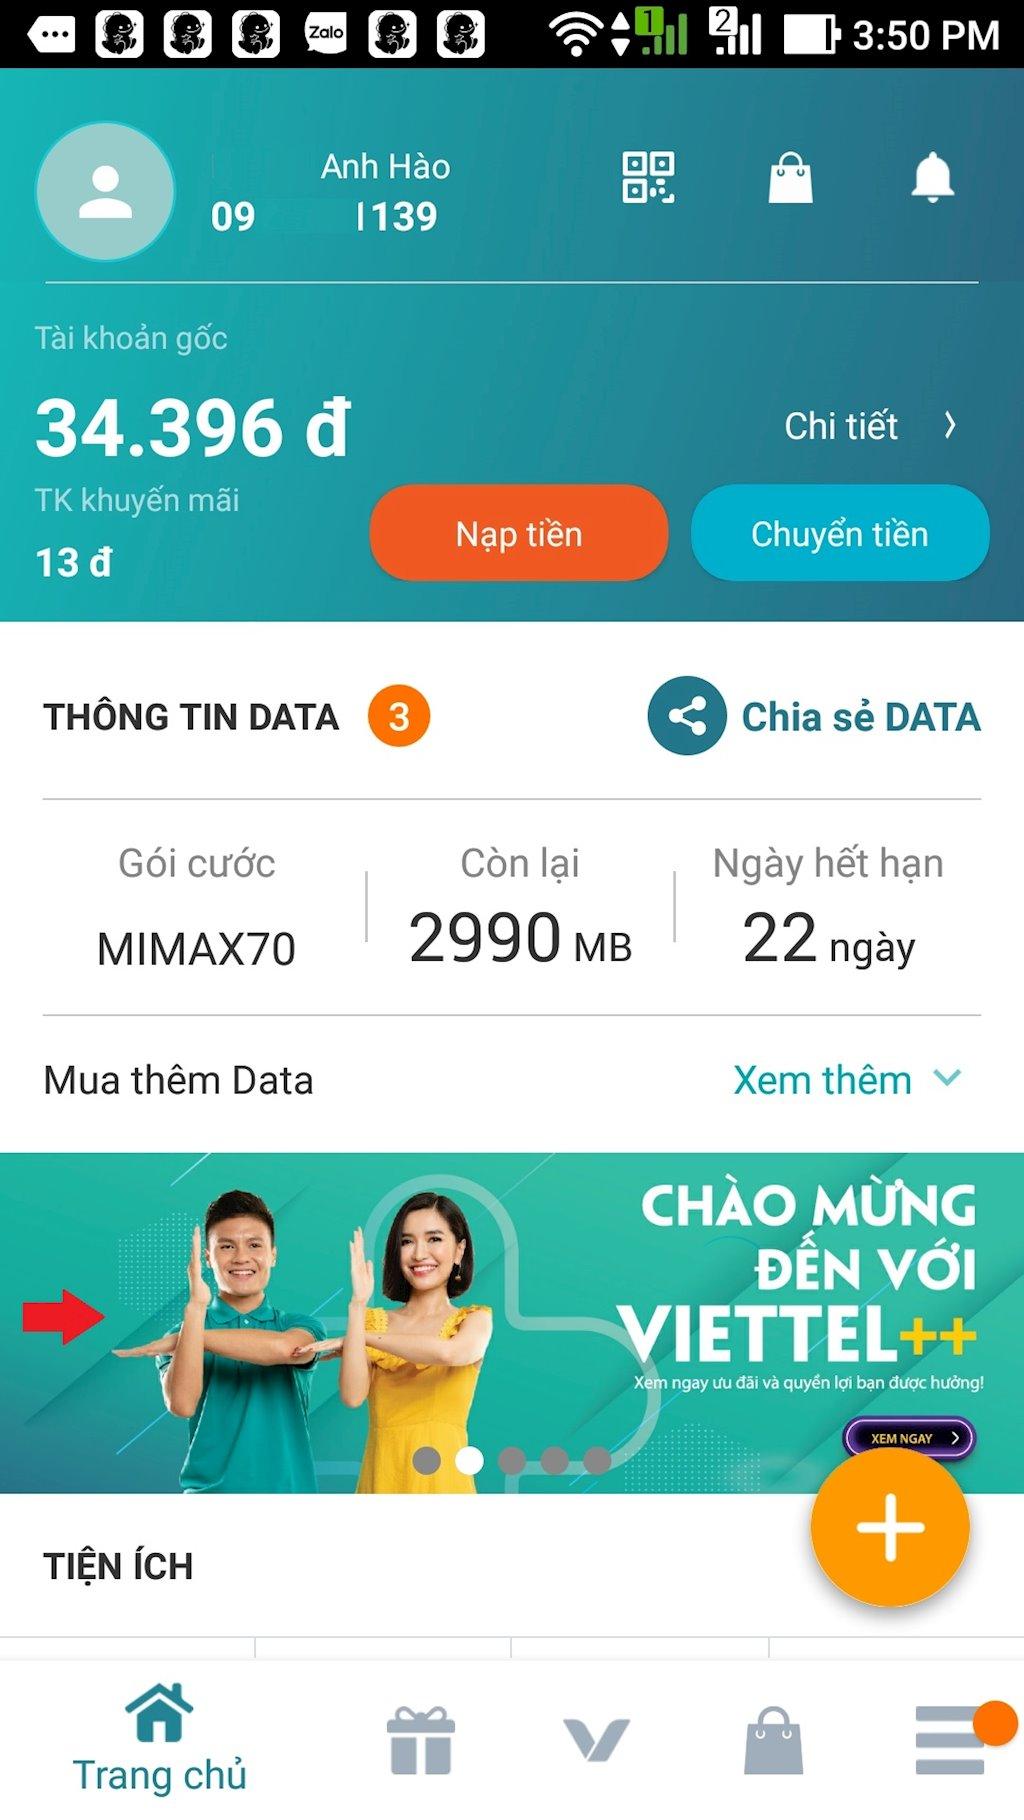 e1-huong-dan-doi-diem-viettel-cach-kiem-diem-viettel-screenshot_20190719-155028(1).jpg